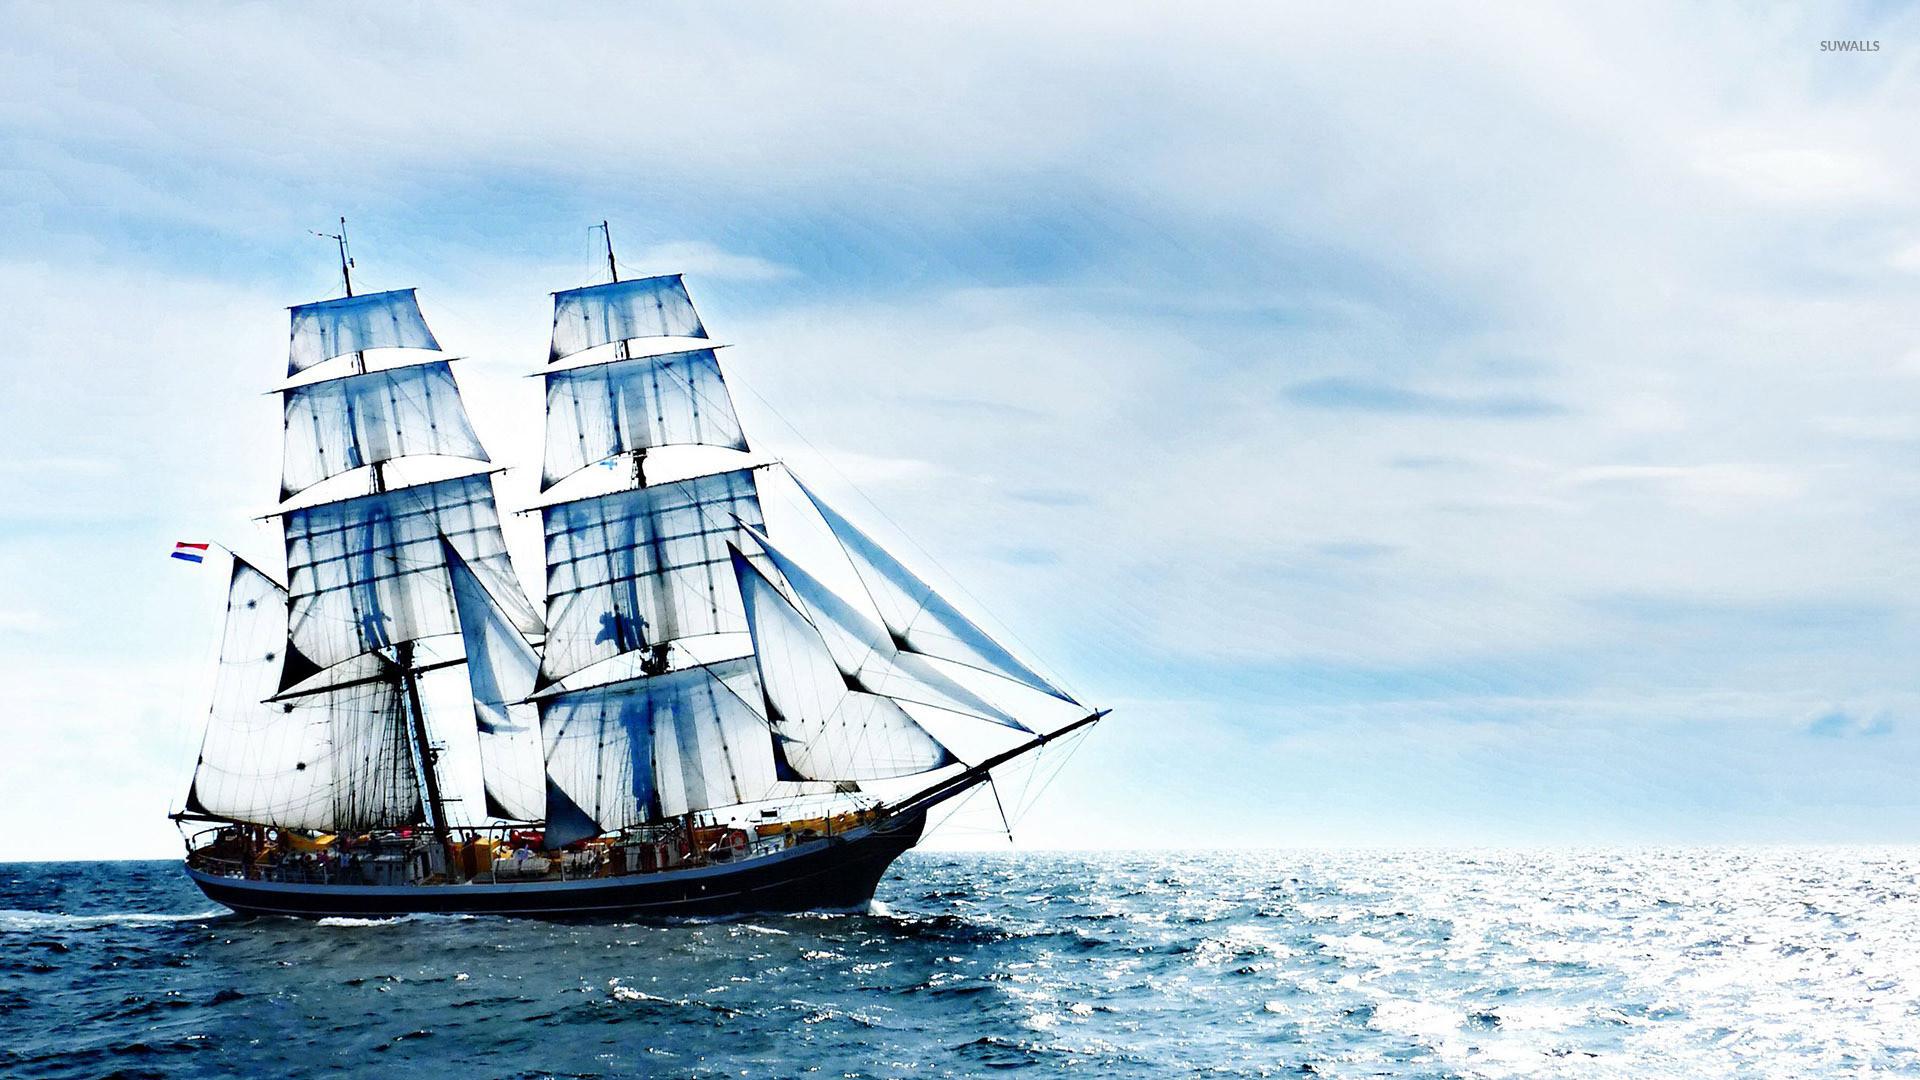 Sailing ship wallpaper desktop